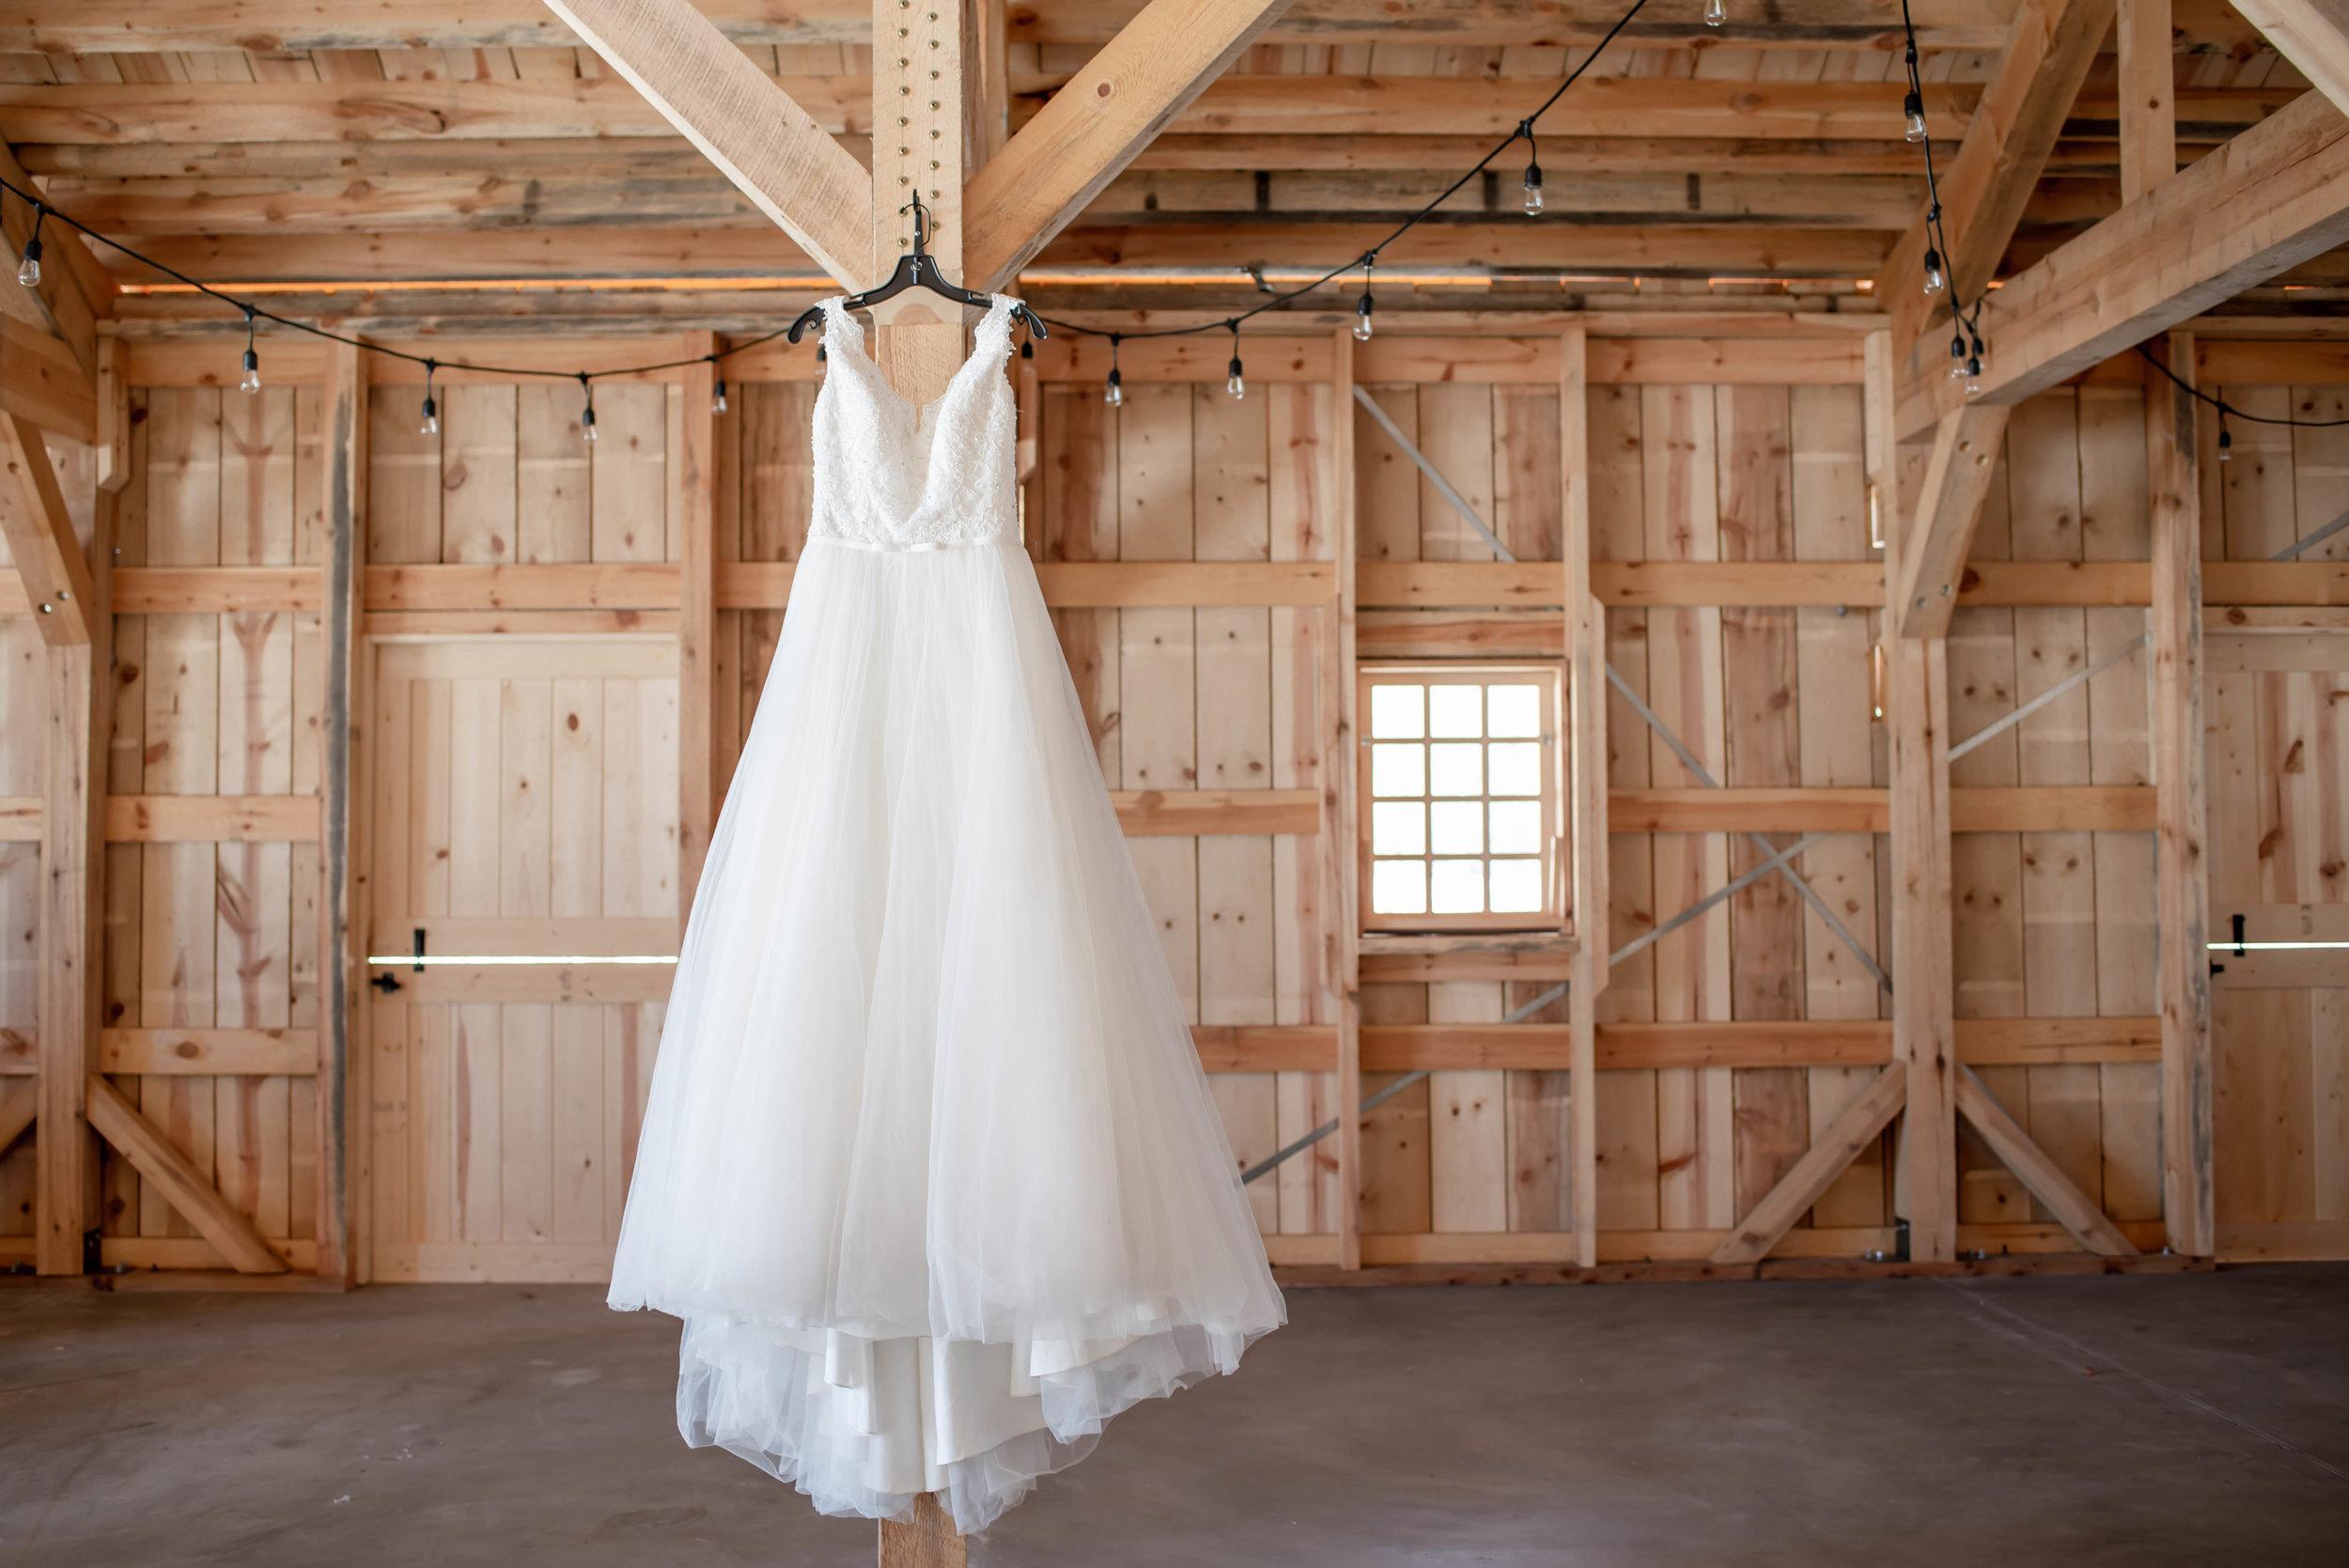 mountain wedding dresses new mexico wedding dress 1.jpg